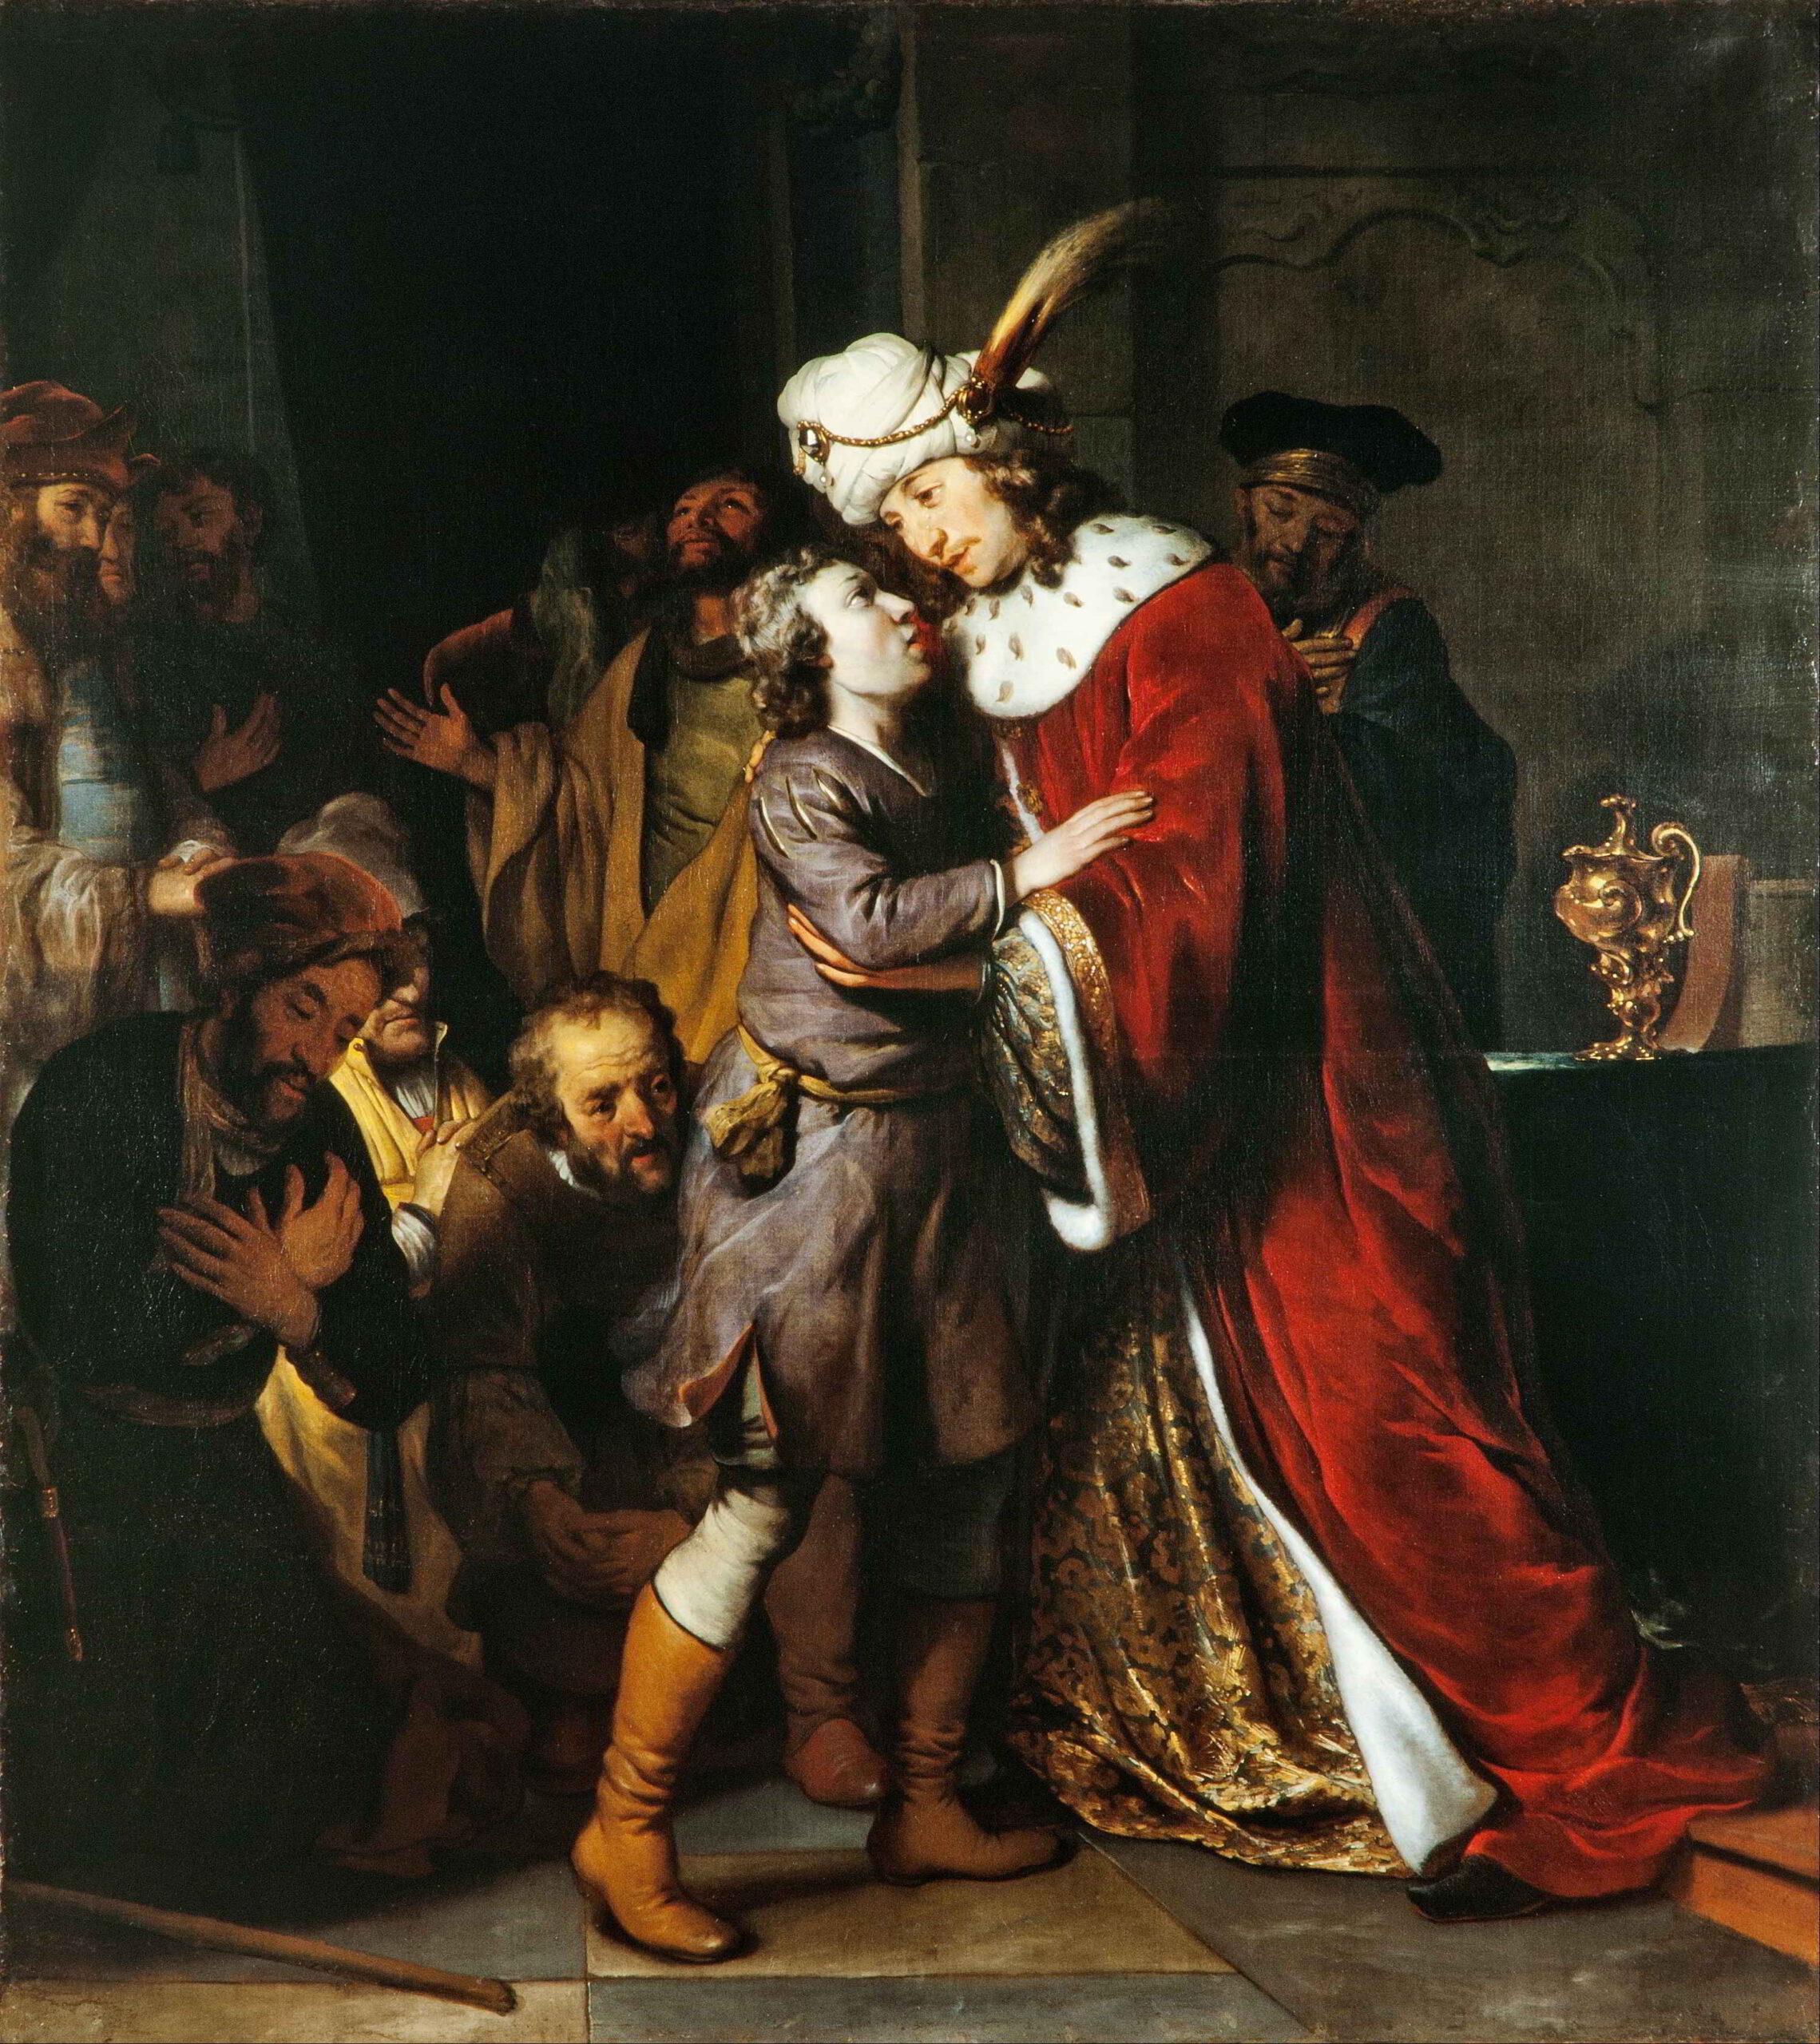 Gerbrand van den Eeckhout (1621-1641), Joseph and his Brothers, 1657 Skokloster Castle, Stockholm